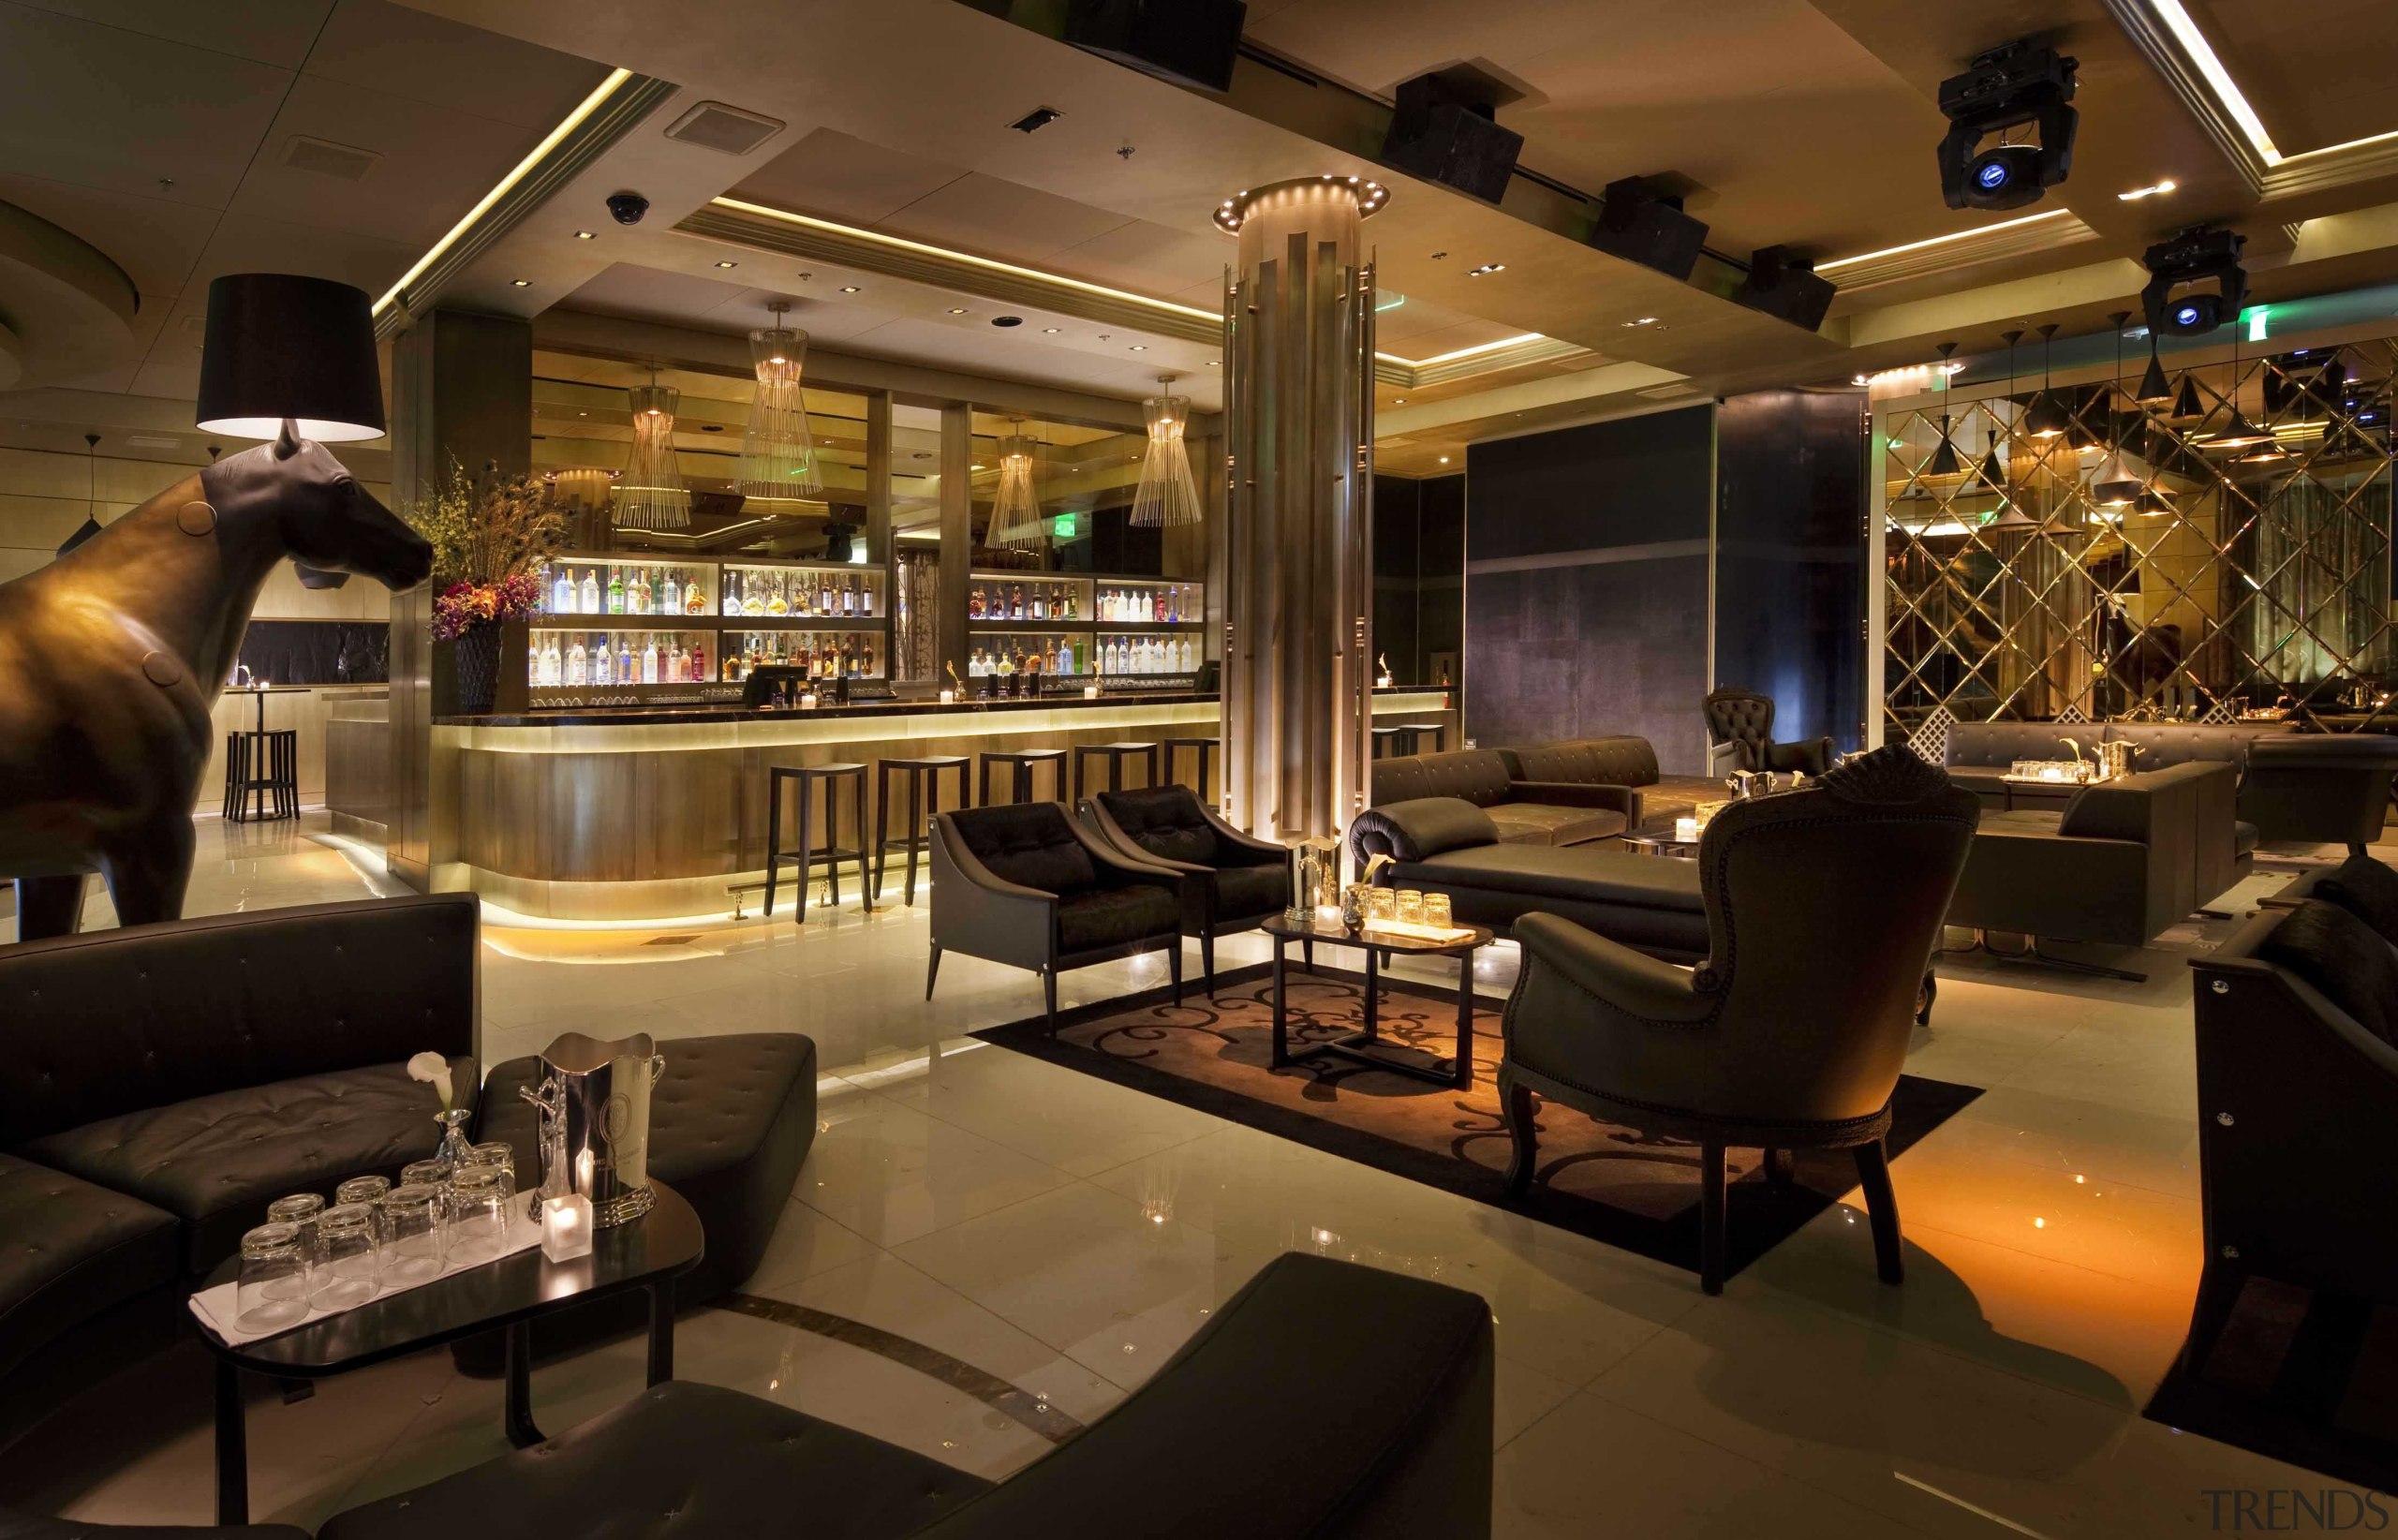 CityCenter, Las Vegas - CityCenter, Las Vegas - bar, café, interior design, restaurant, brown, black